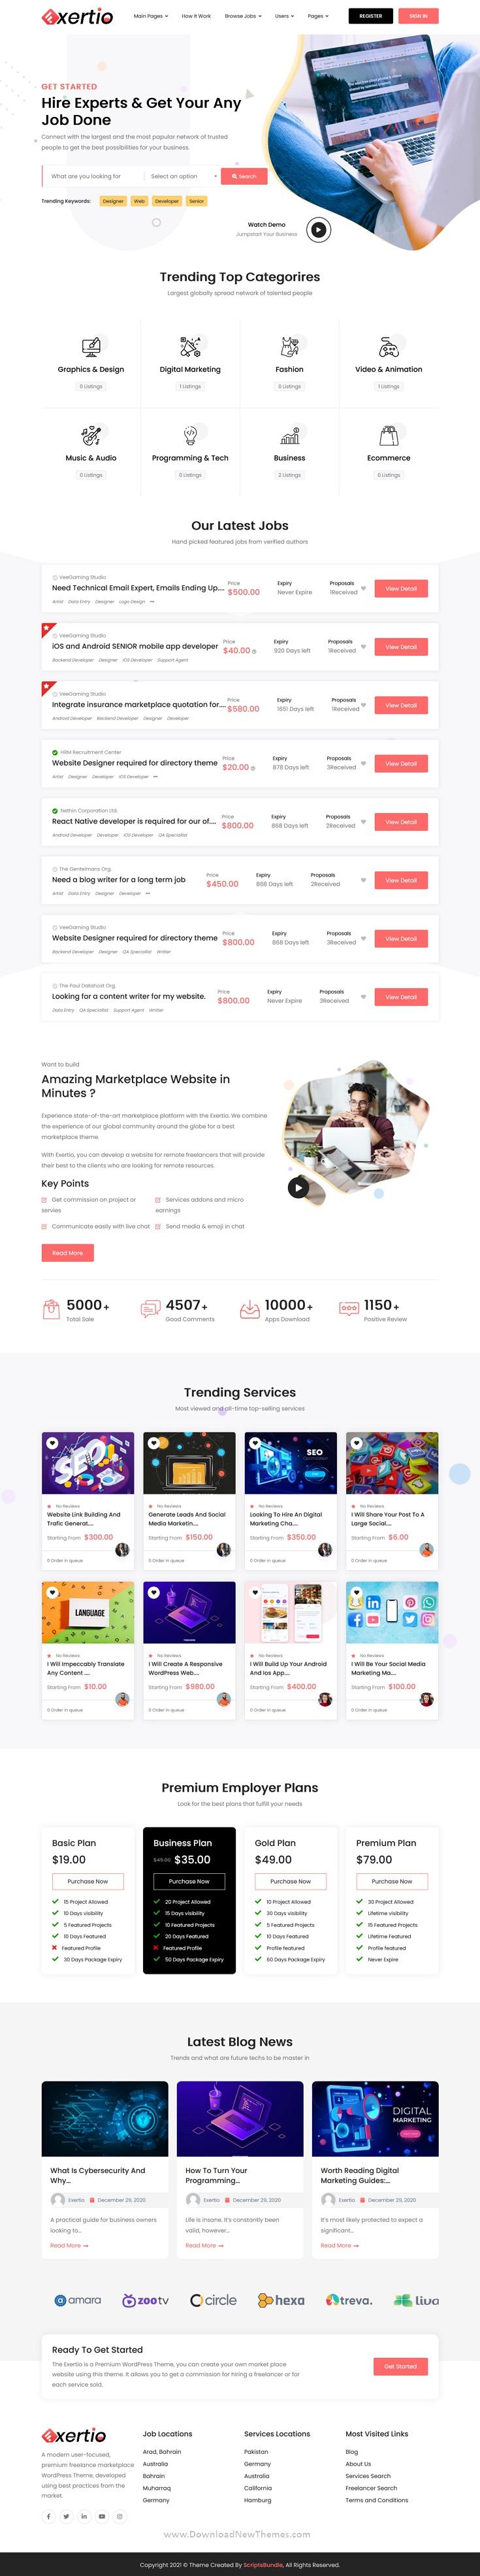 Exertio - Freelance Marketplace HTML Template